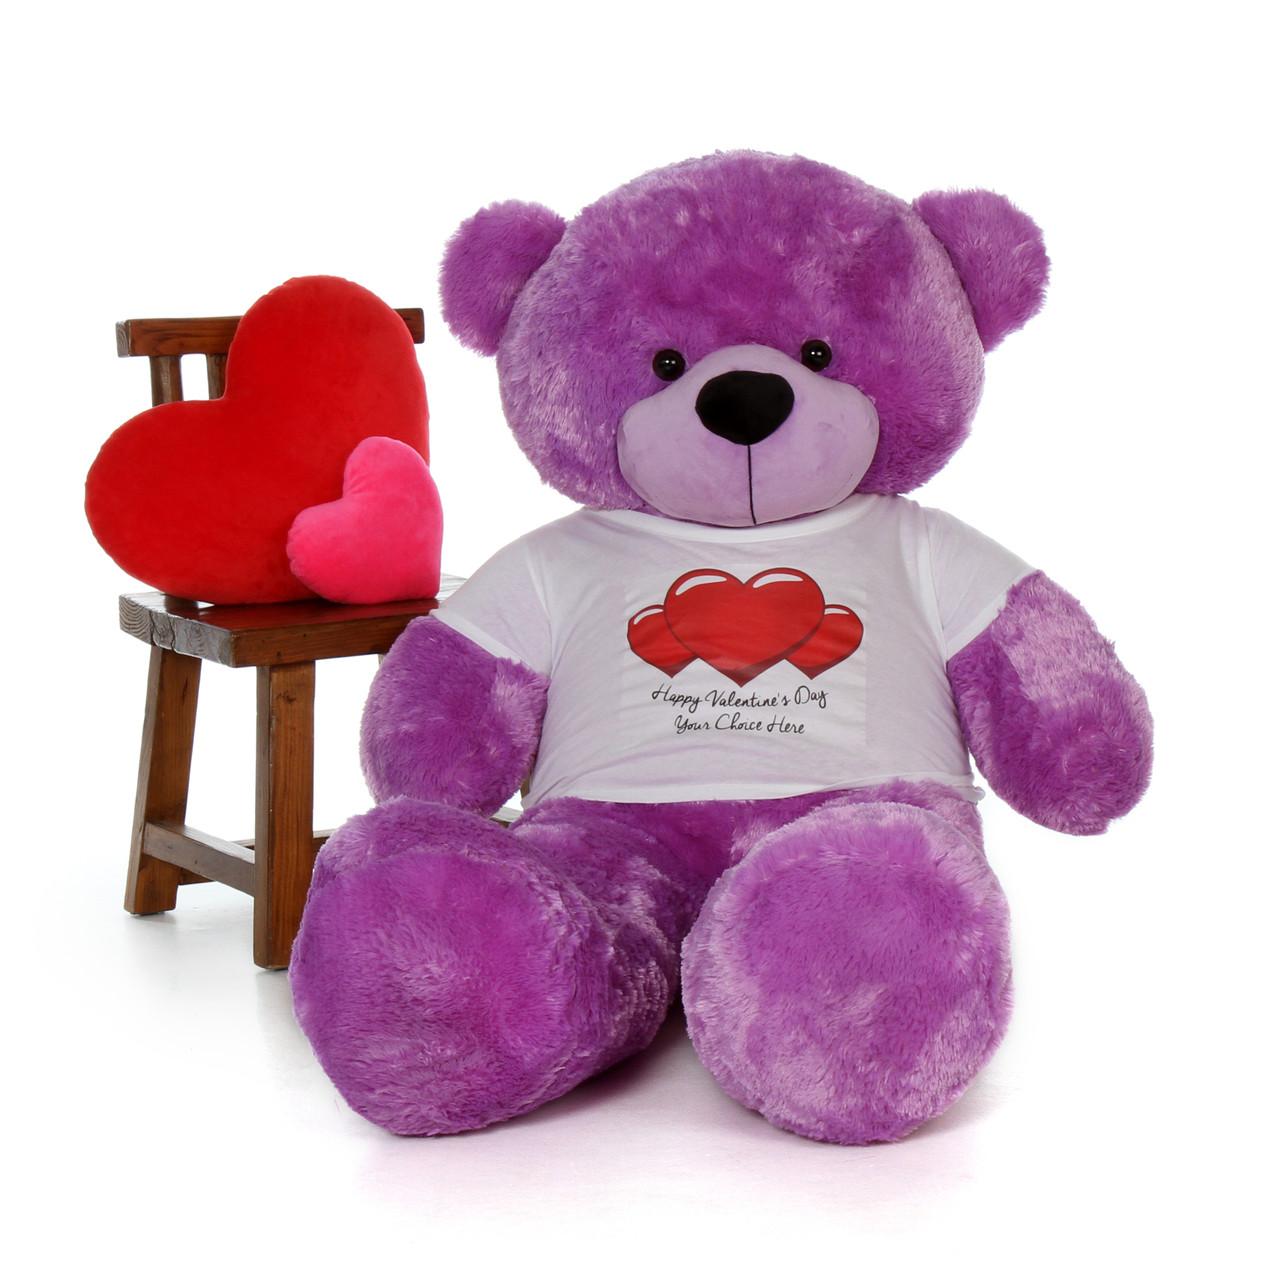 60in DeeDee Cuddles Purple Giant Teddy in Happy Valentine's Day Red Heart Shirt